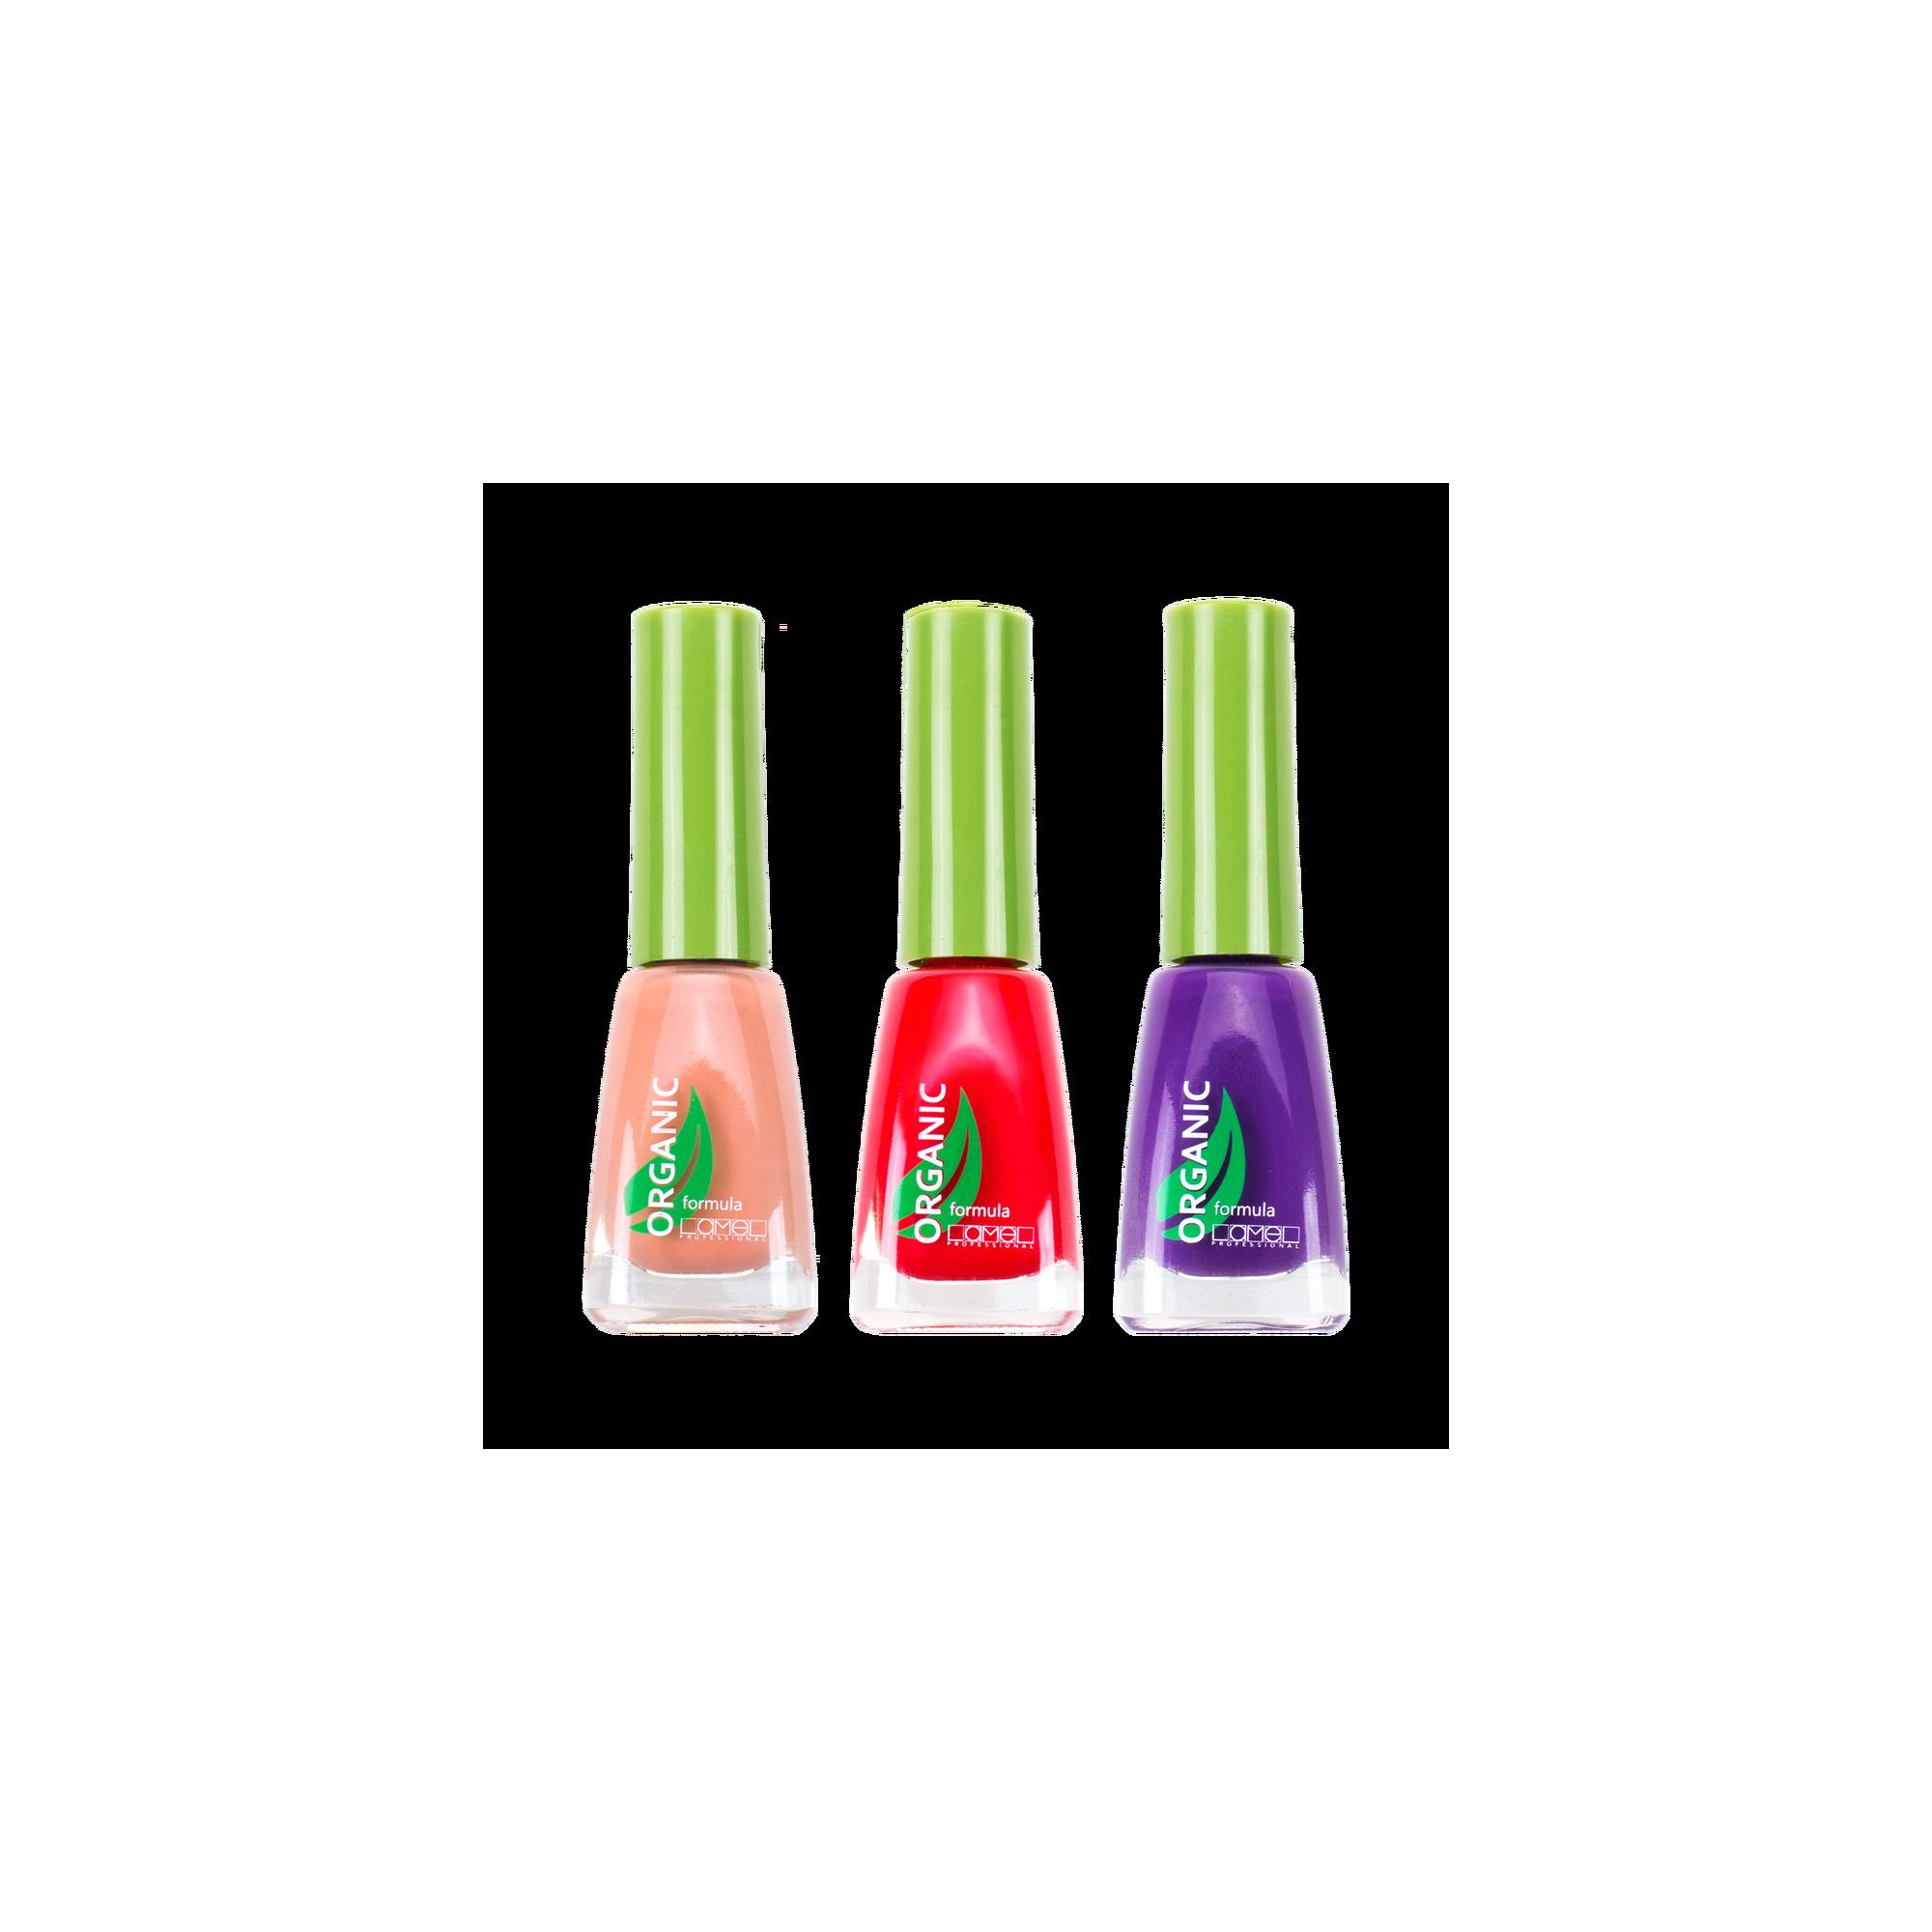 Organic polish lamelcosmetics. Nail clipart cutics